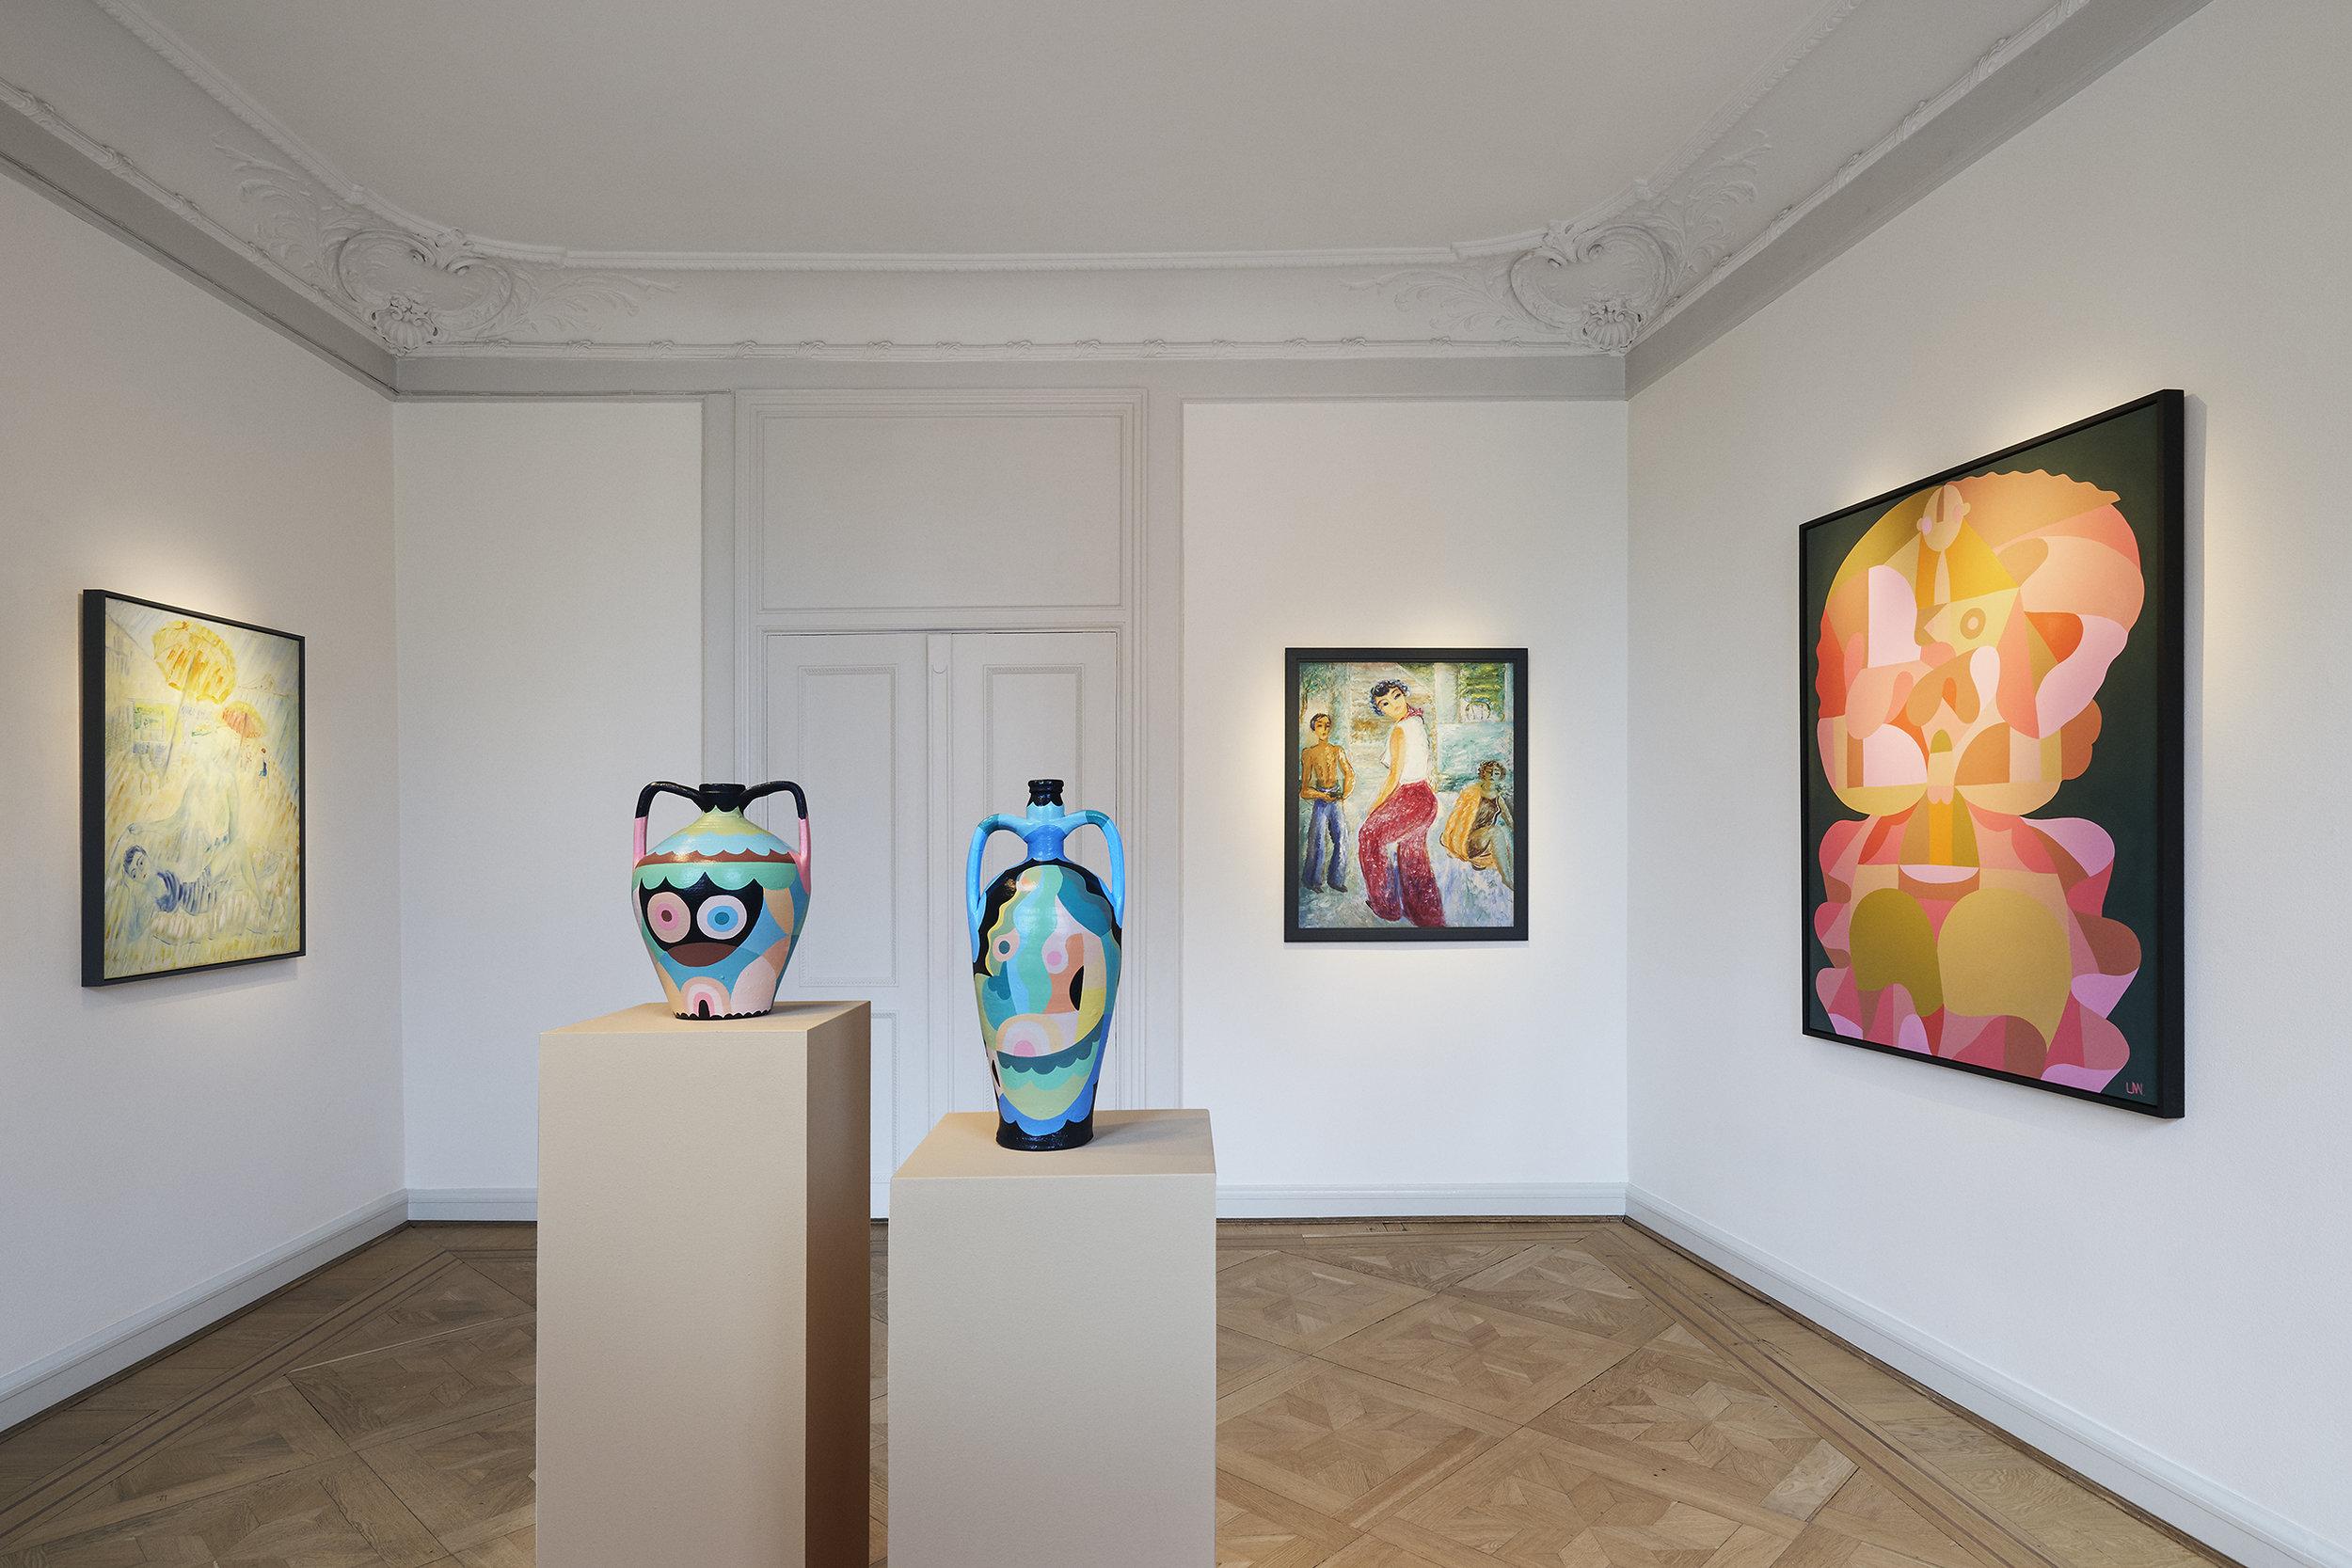 Two artistis,two centuries - Now open at CFHILL:Liselotte Watkins & Sigrid Hjertén